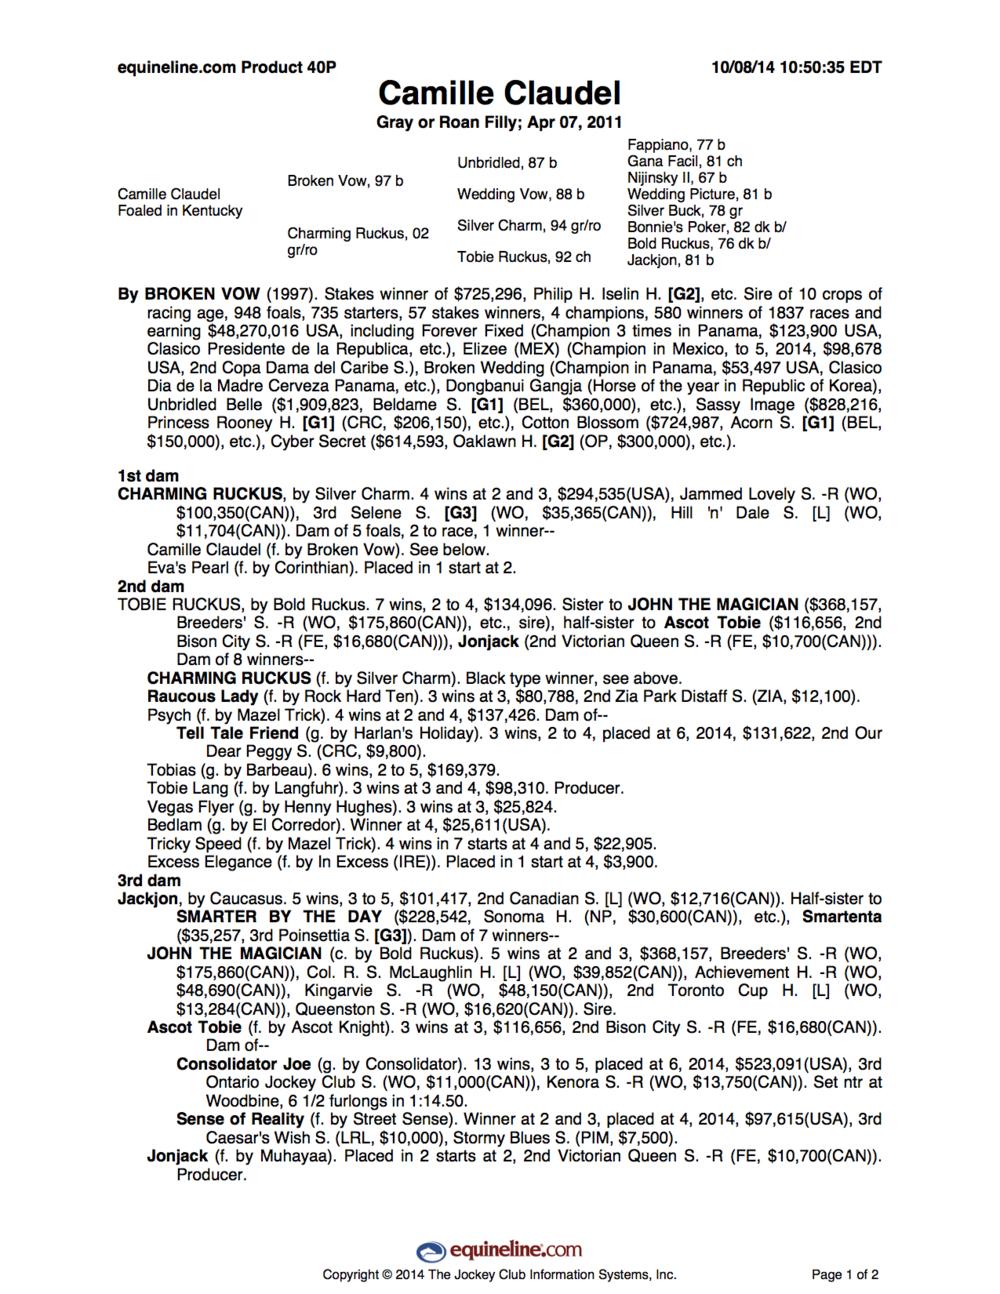 CAMILLE CLAUDEL PEDIGREE pedigree page 1.png